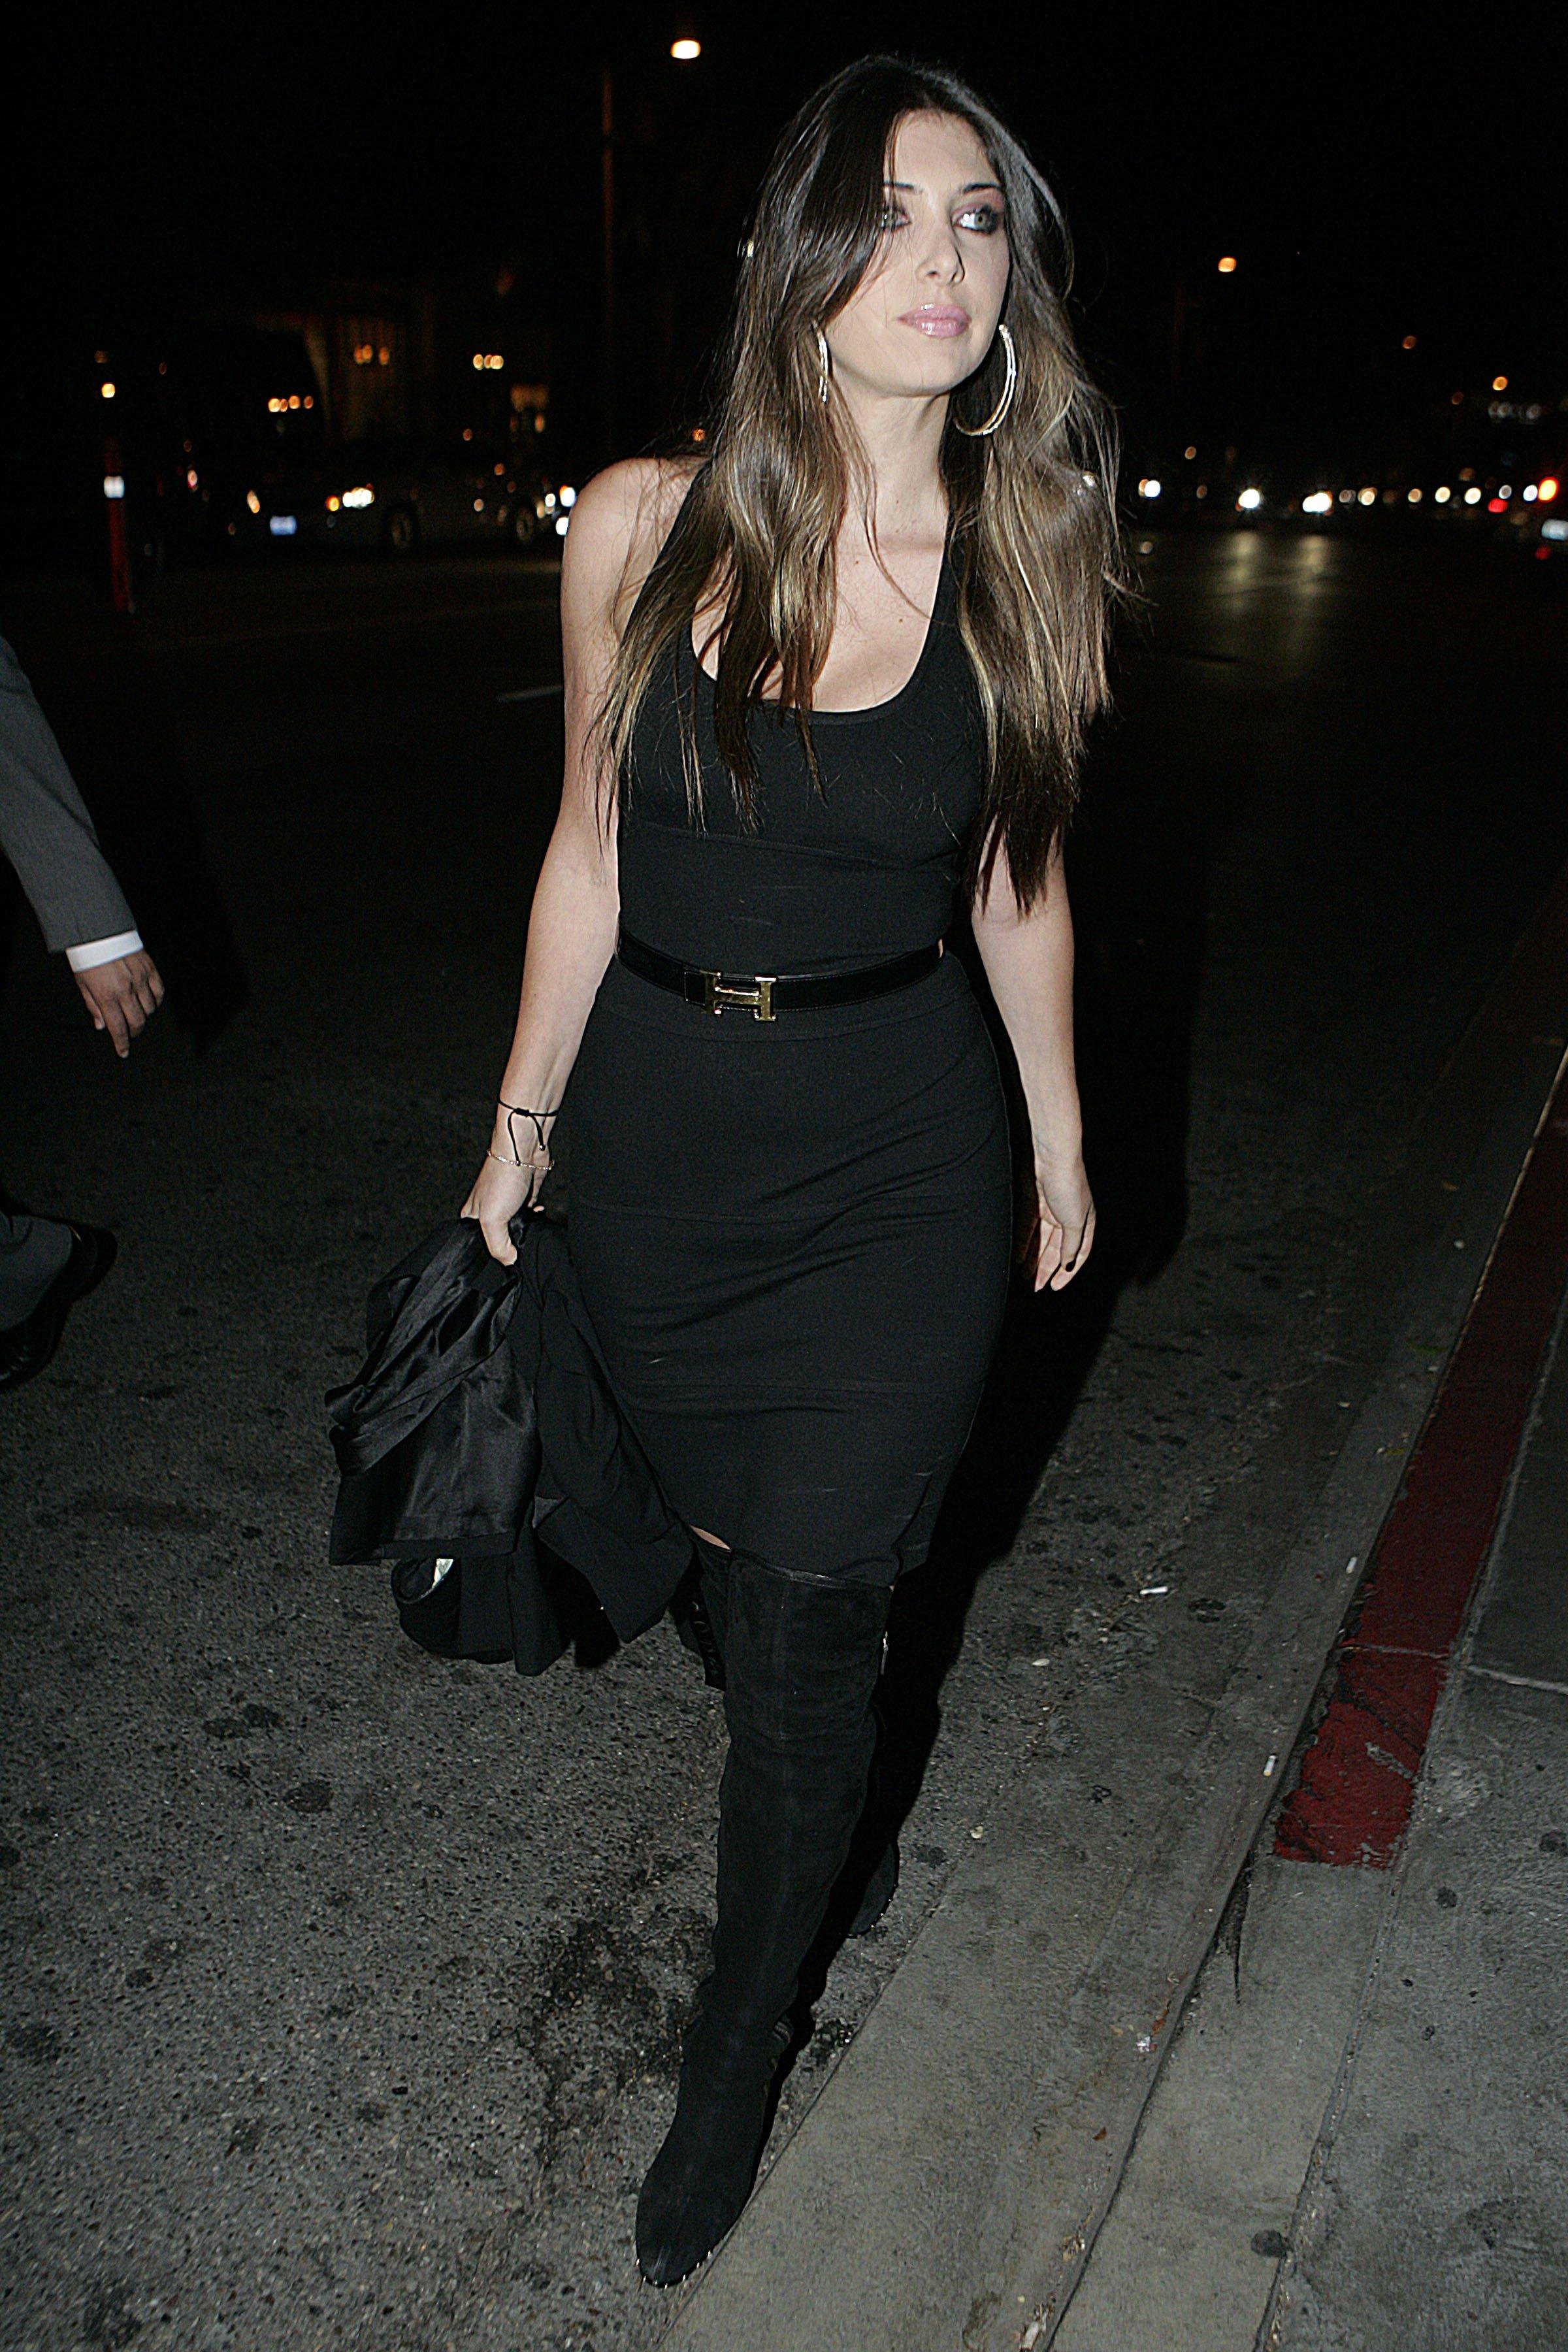 71350_celebrity-paradise.com-The_Elder-Brittny_Gastineau_2009-10-19_-_STK_Restaurant_in_Los_Angeles_633_122_195lo.JPG